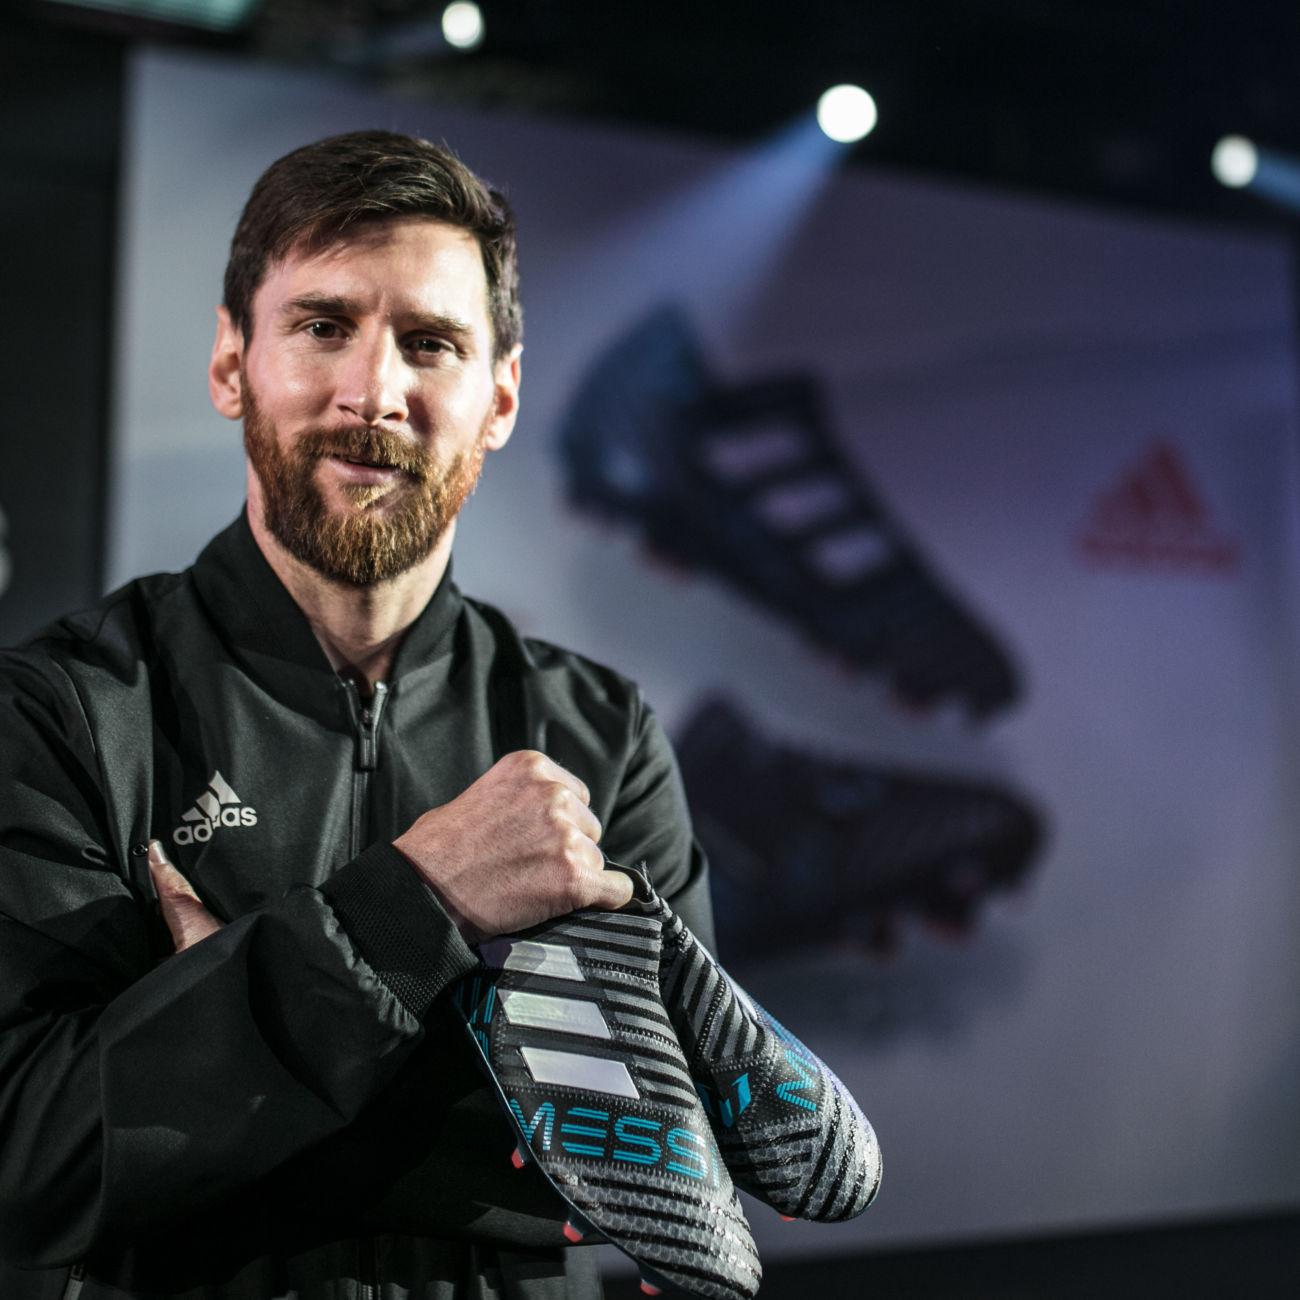 botas de fútbol Nemeziz presentadas por Leo Messi Leo Messi ha presentado en  Barcelona sus nuevas ... dbabf6b9814